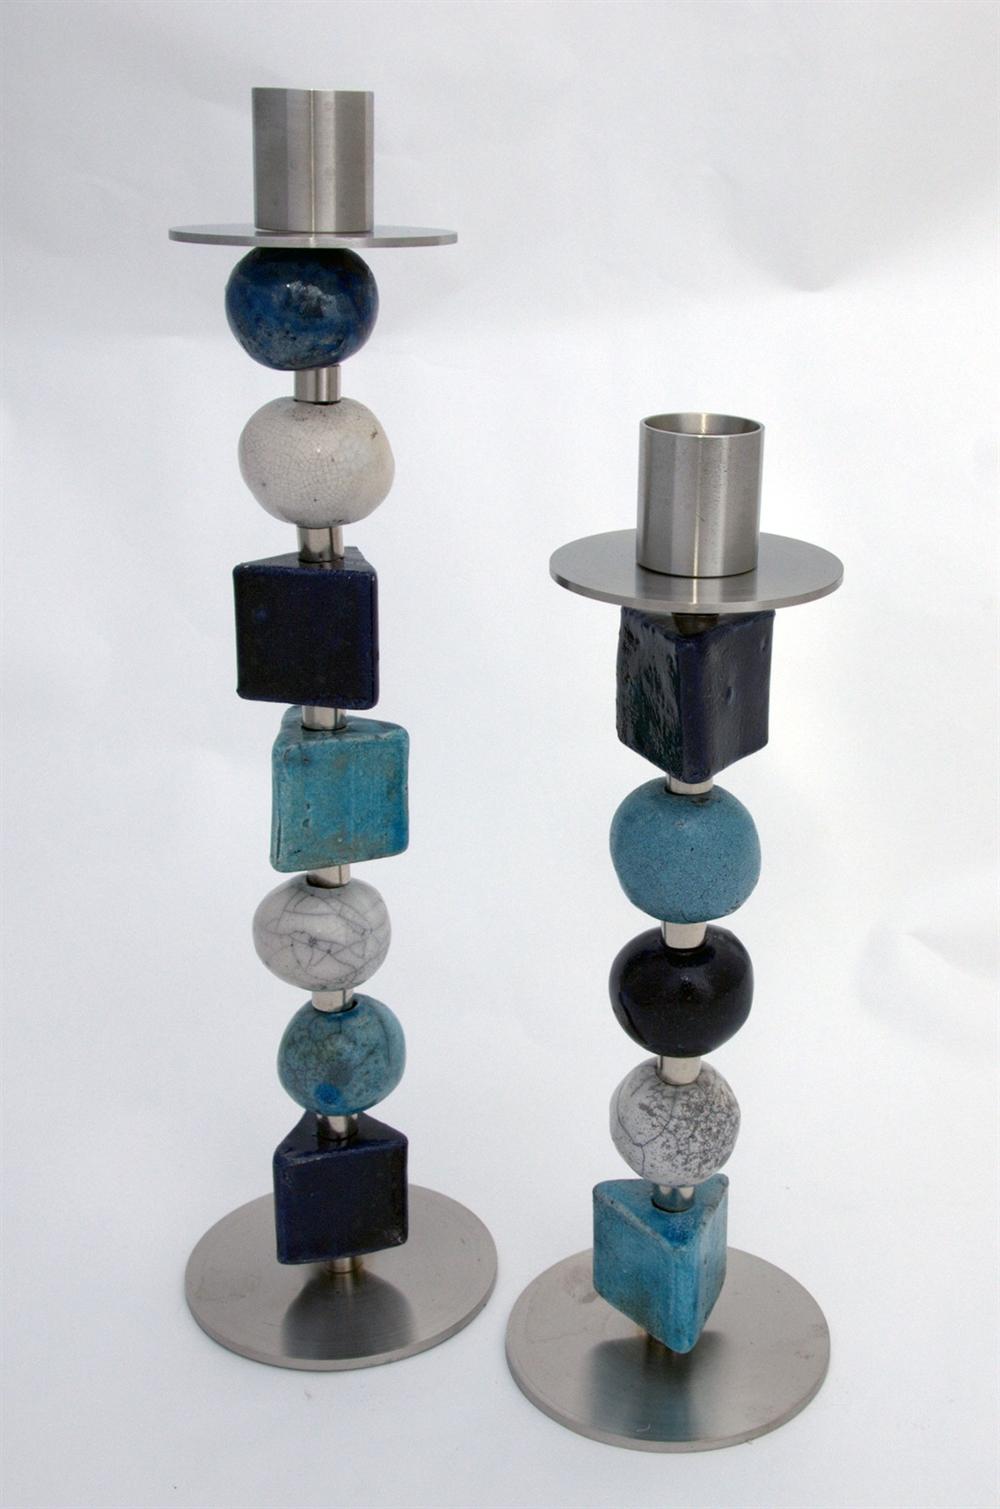 keramik lysestager Keramik lysestager blå keramik lysestager